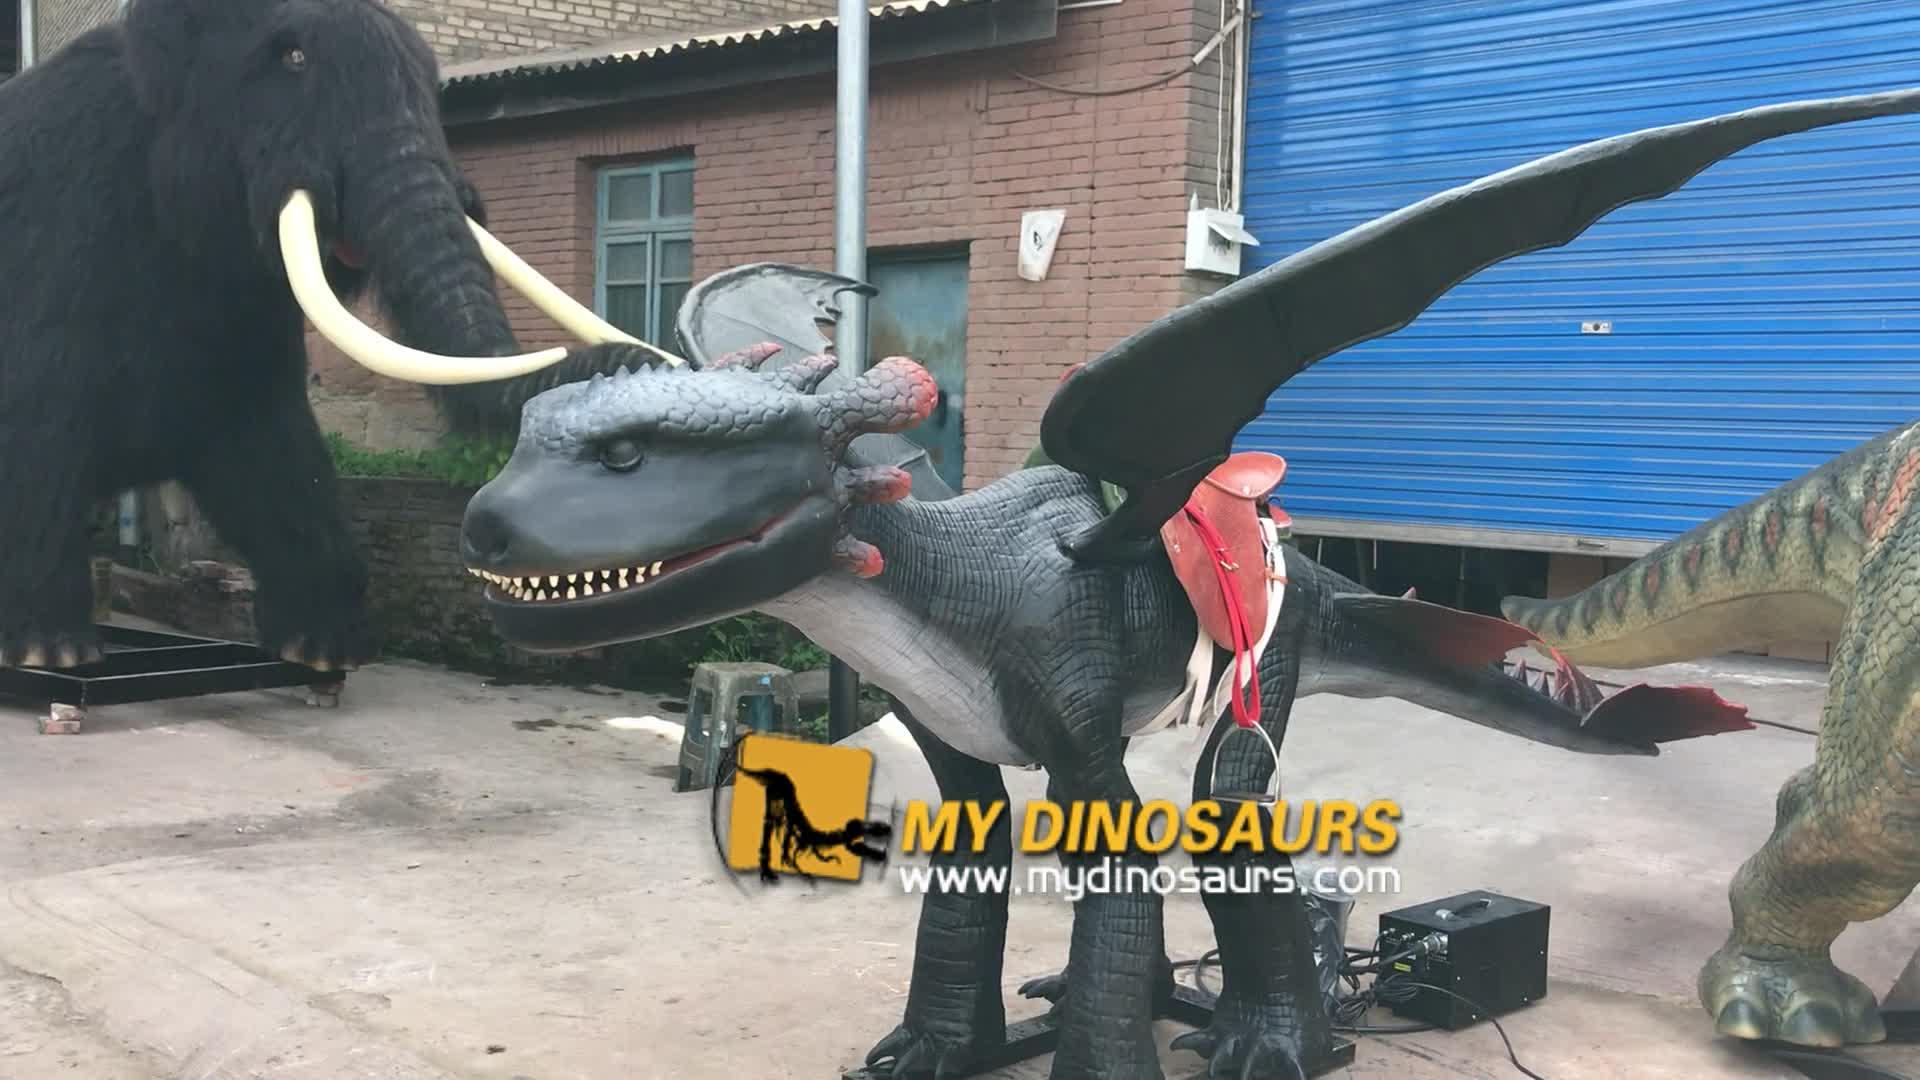 MY DINO-Q042 Animatronic Western Dragon Rides for Children Playground Equipment